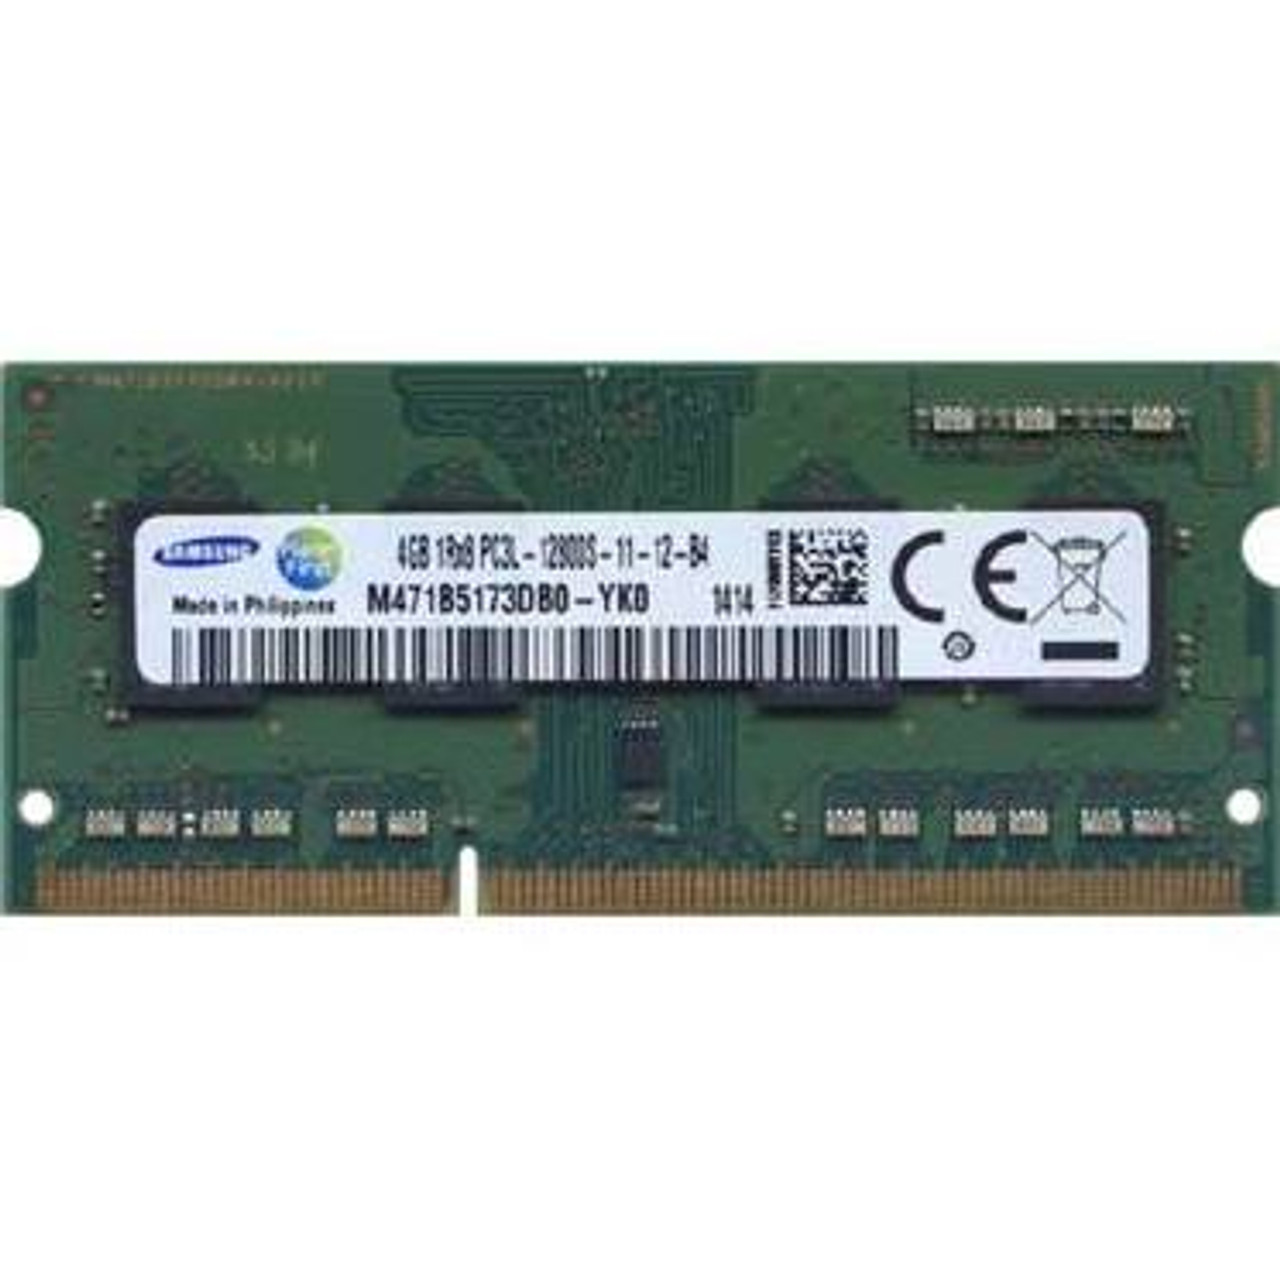 PARTS-QUICK Brand 4GB Memory for Toshiba Satellite Pro T130-15F DDR3 PC3-8500 RAM Upgrade